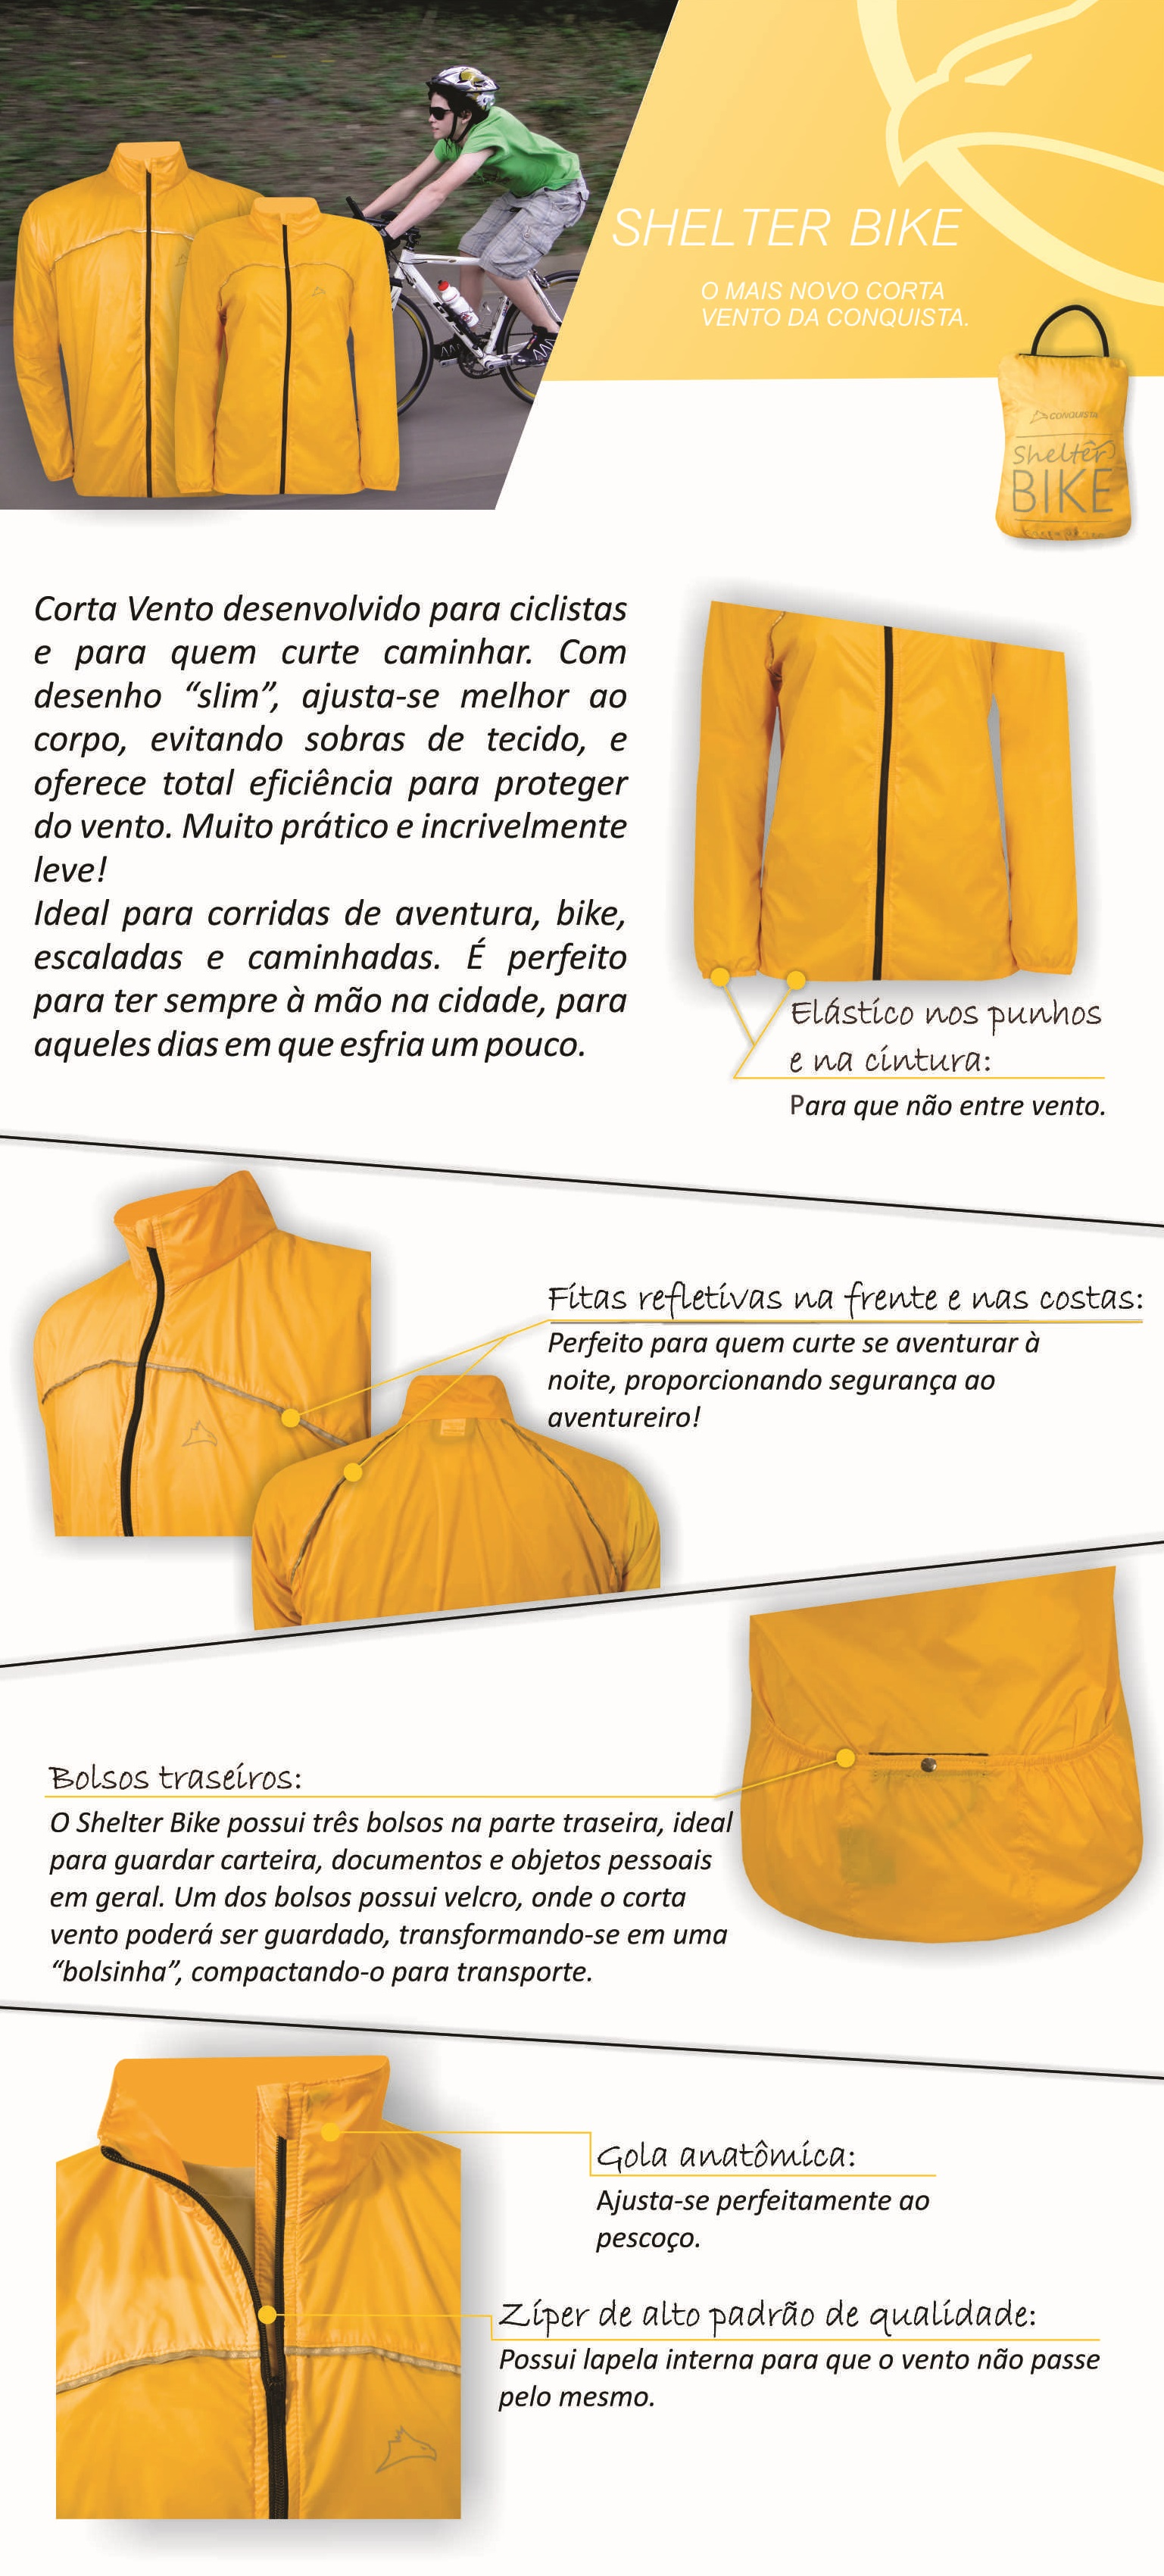 Informações Corta Vento Shelter Bike